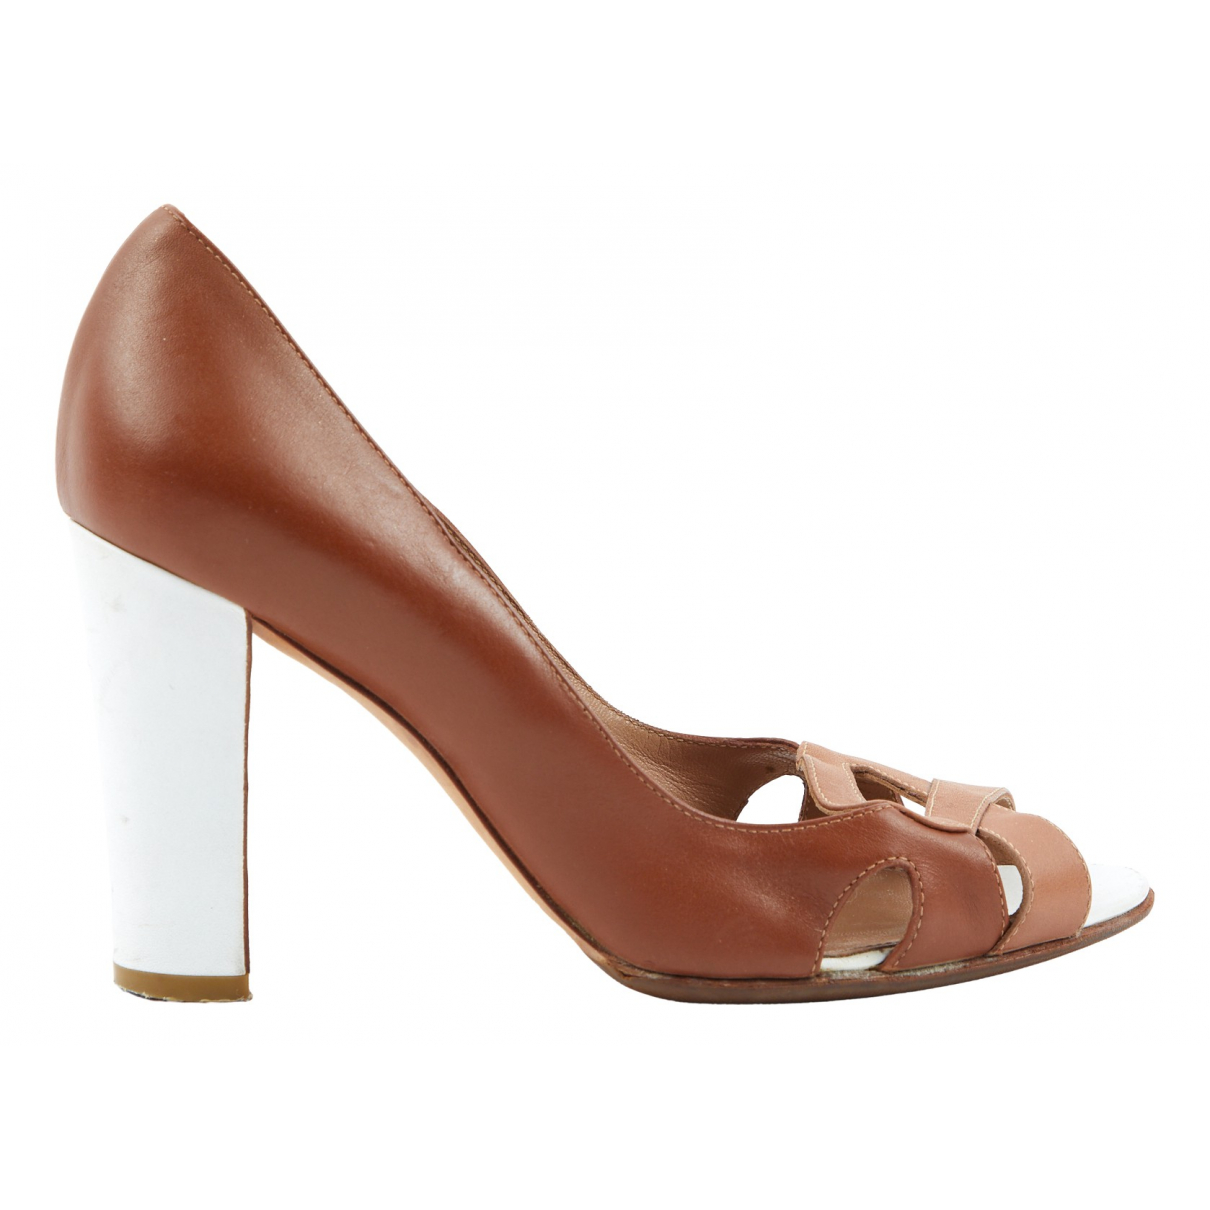 Sergio Rossi N Brown Leather Heels for Women 36 EU